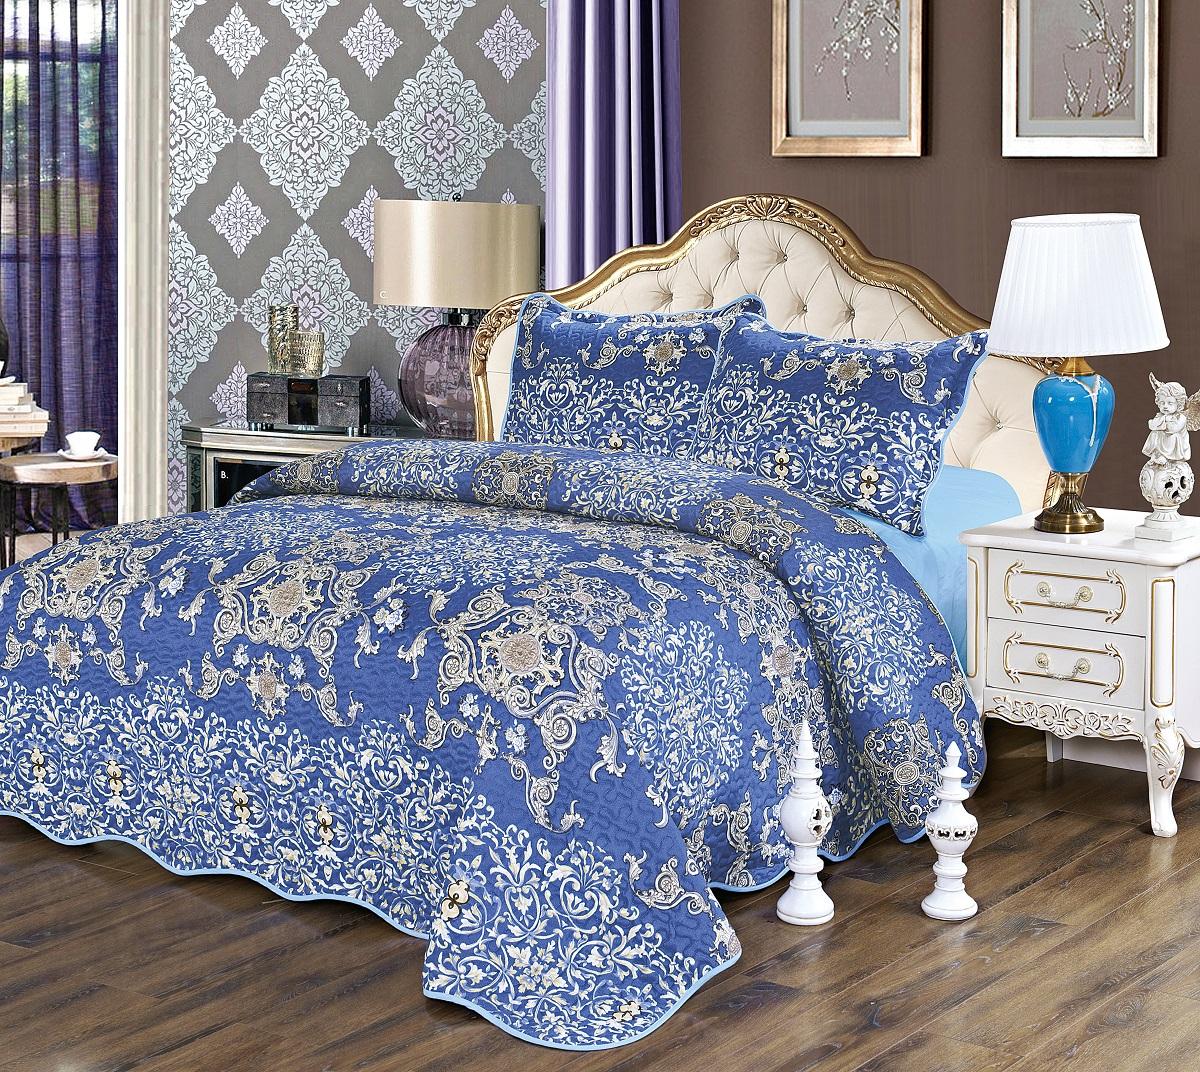 Комплект для спальни Karna Gretal: покрывало 230 х 250 см, наволочки 50 х 70 см, цвет: роял комплект для спальни сайлид twiggi покрывало 230 х 250 см 2 наволочки 50 х 70 см цвет голубой